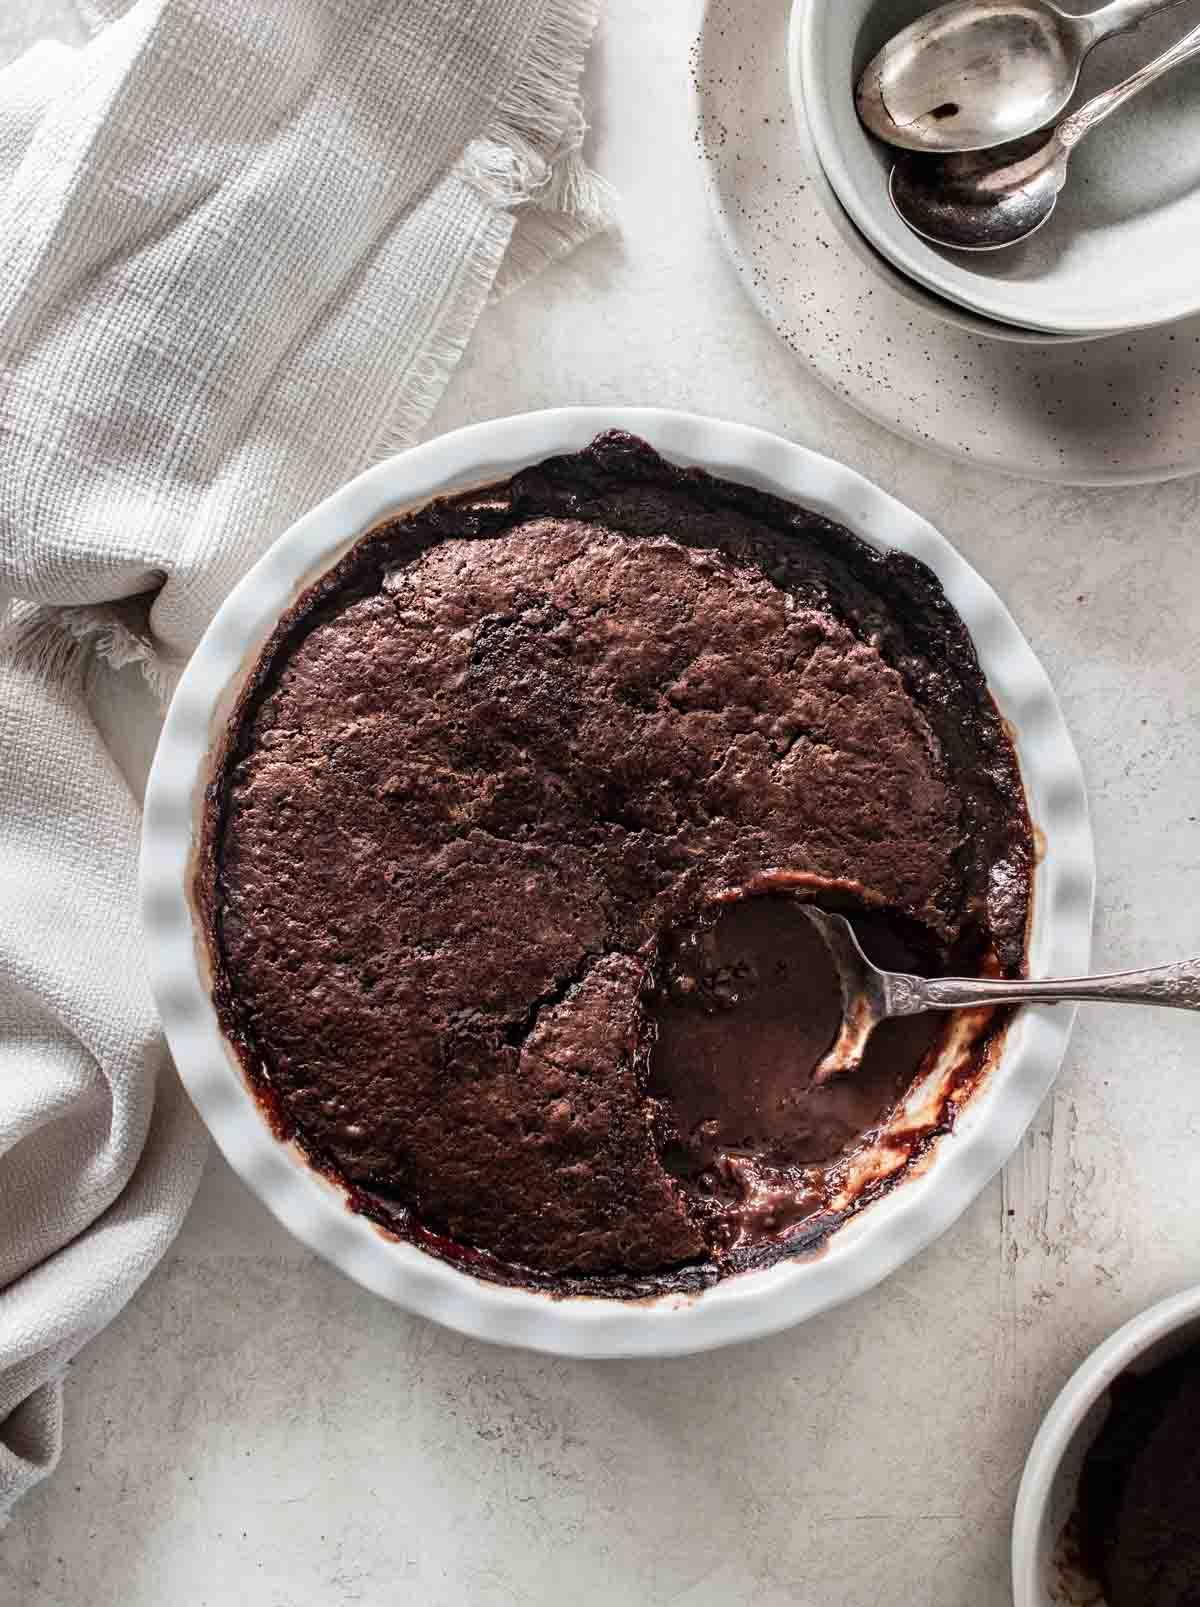 microwave chocolate pudding